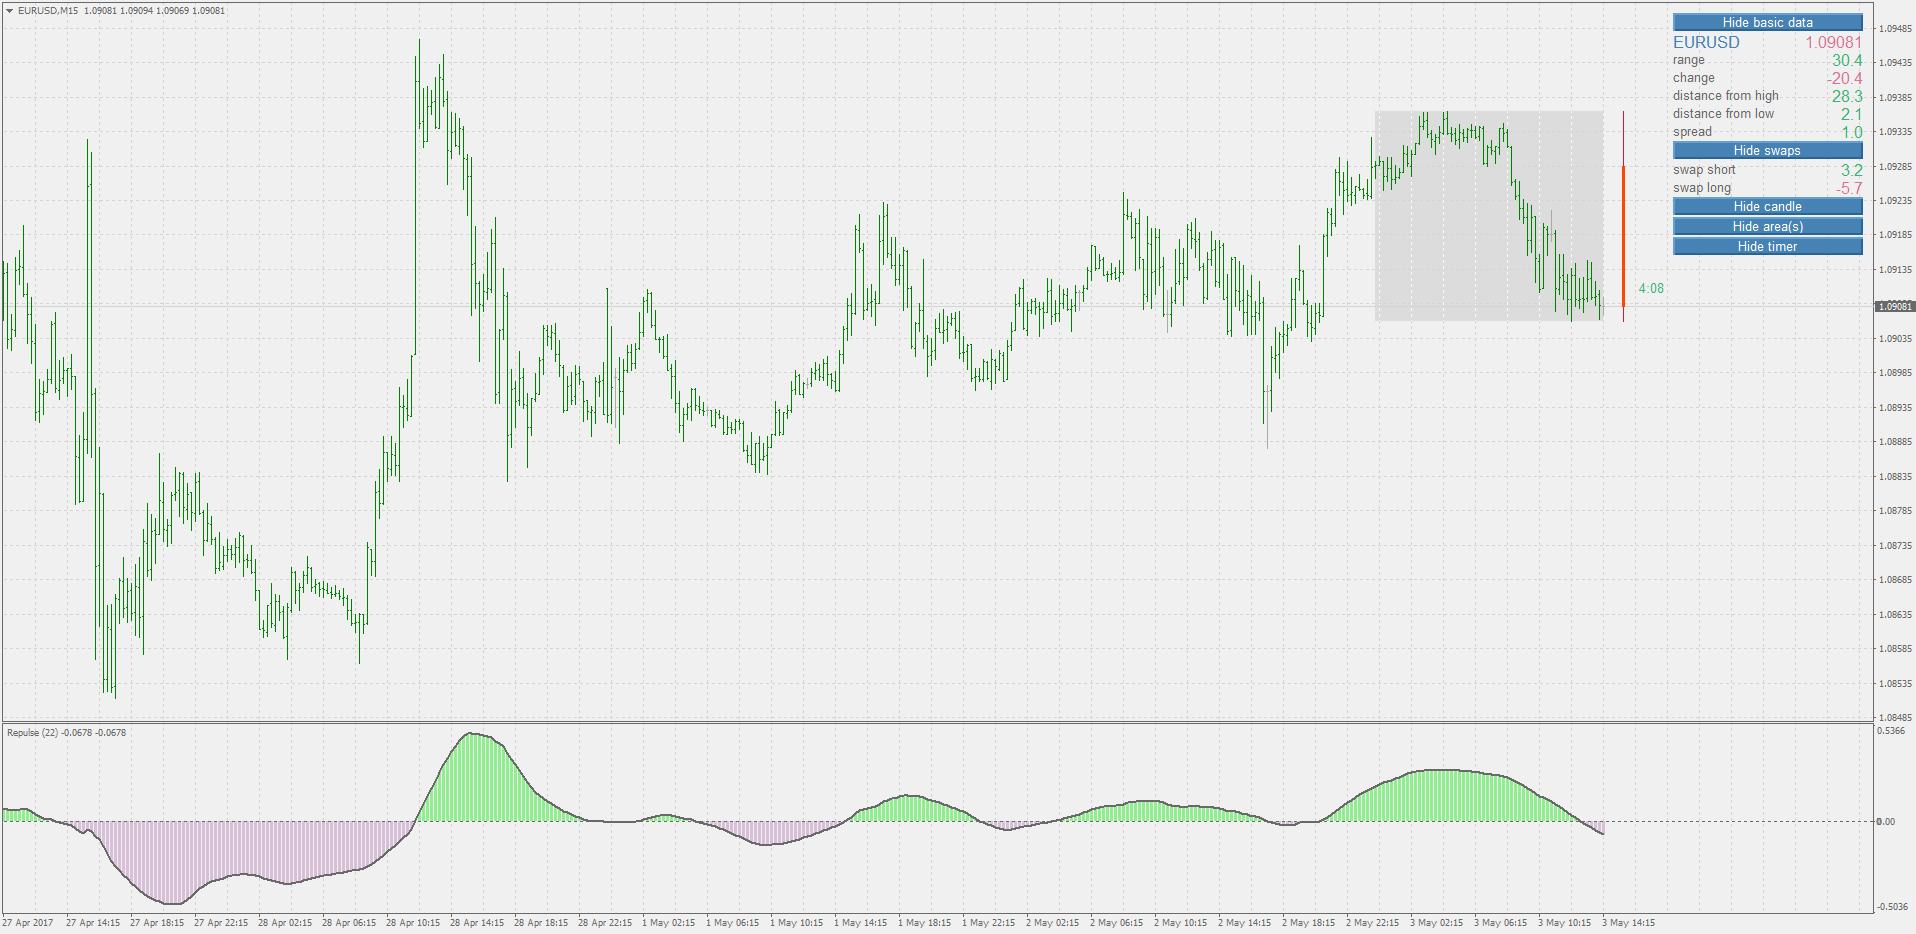 Repulse indicator forex sjuggerud investment